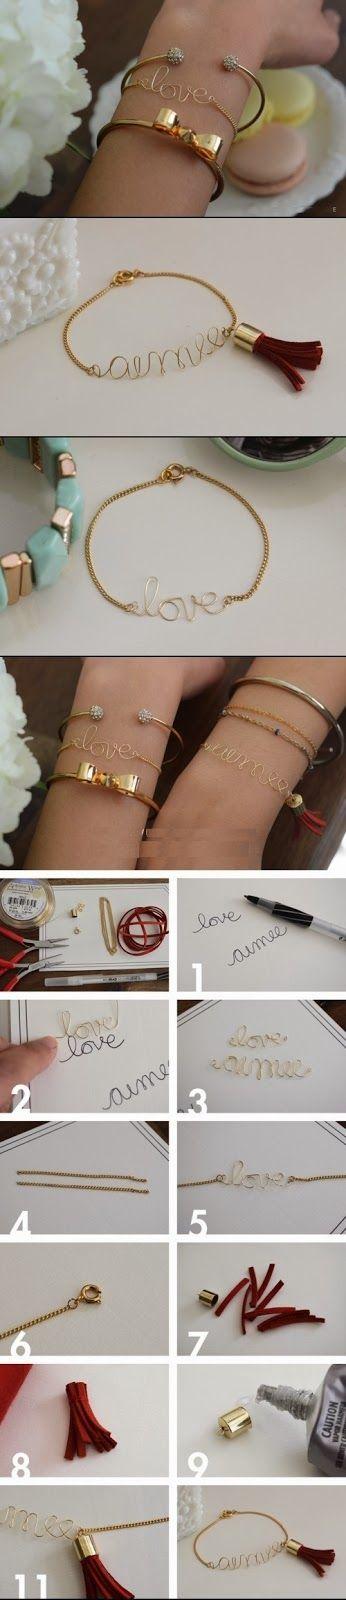 DIY Word Bracelet